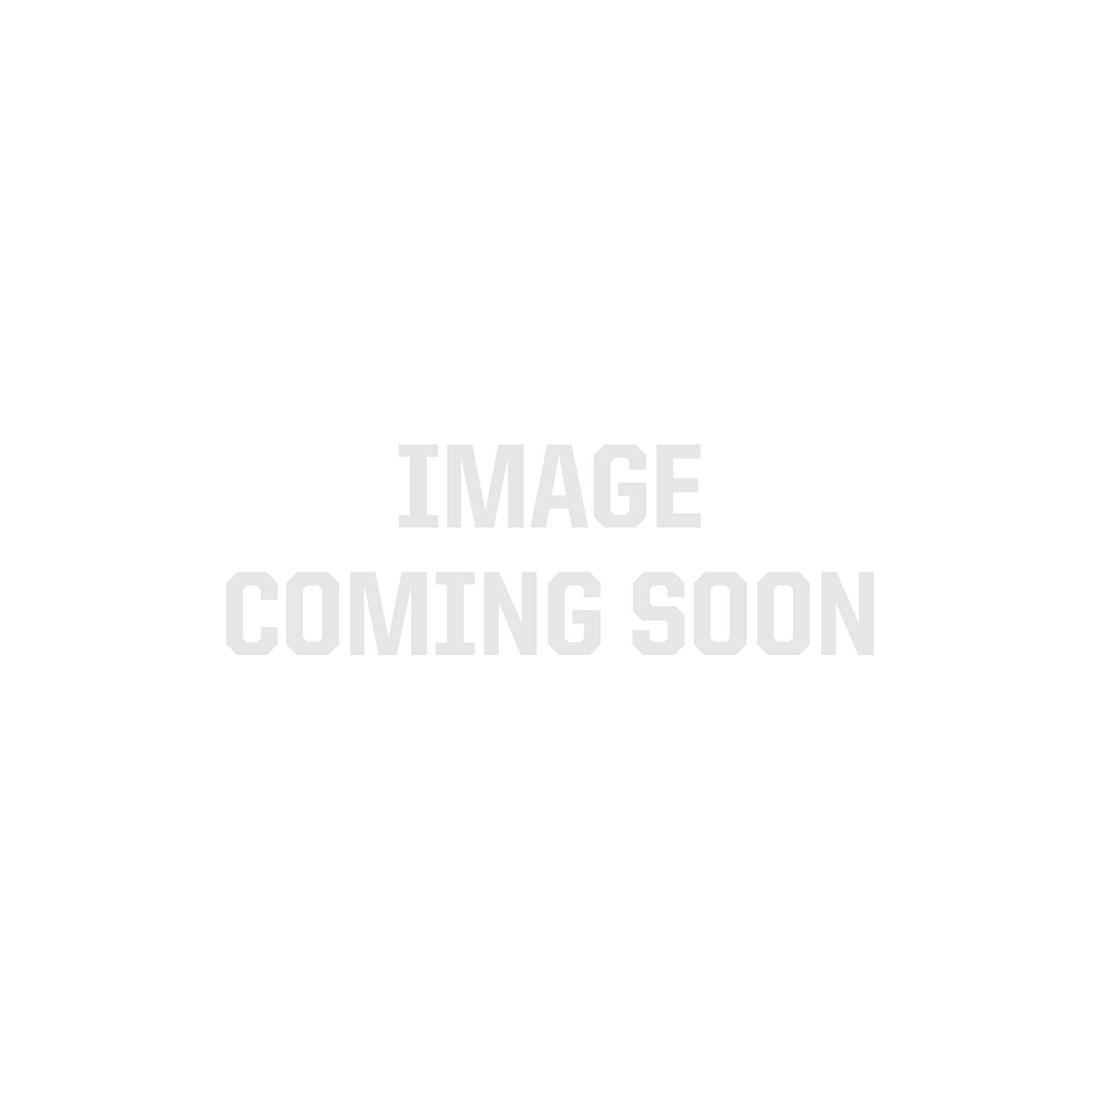 HyperFlex 2835 LED Strip Light - 4,000K - 60/m - CurrentControl - Sample Kit